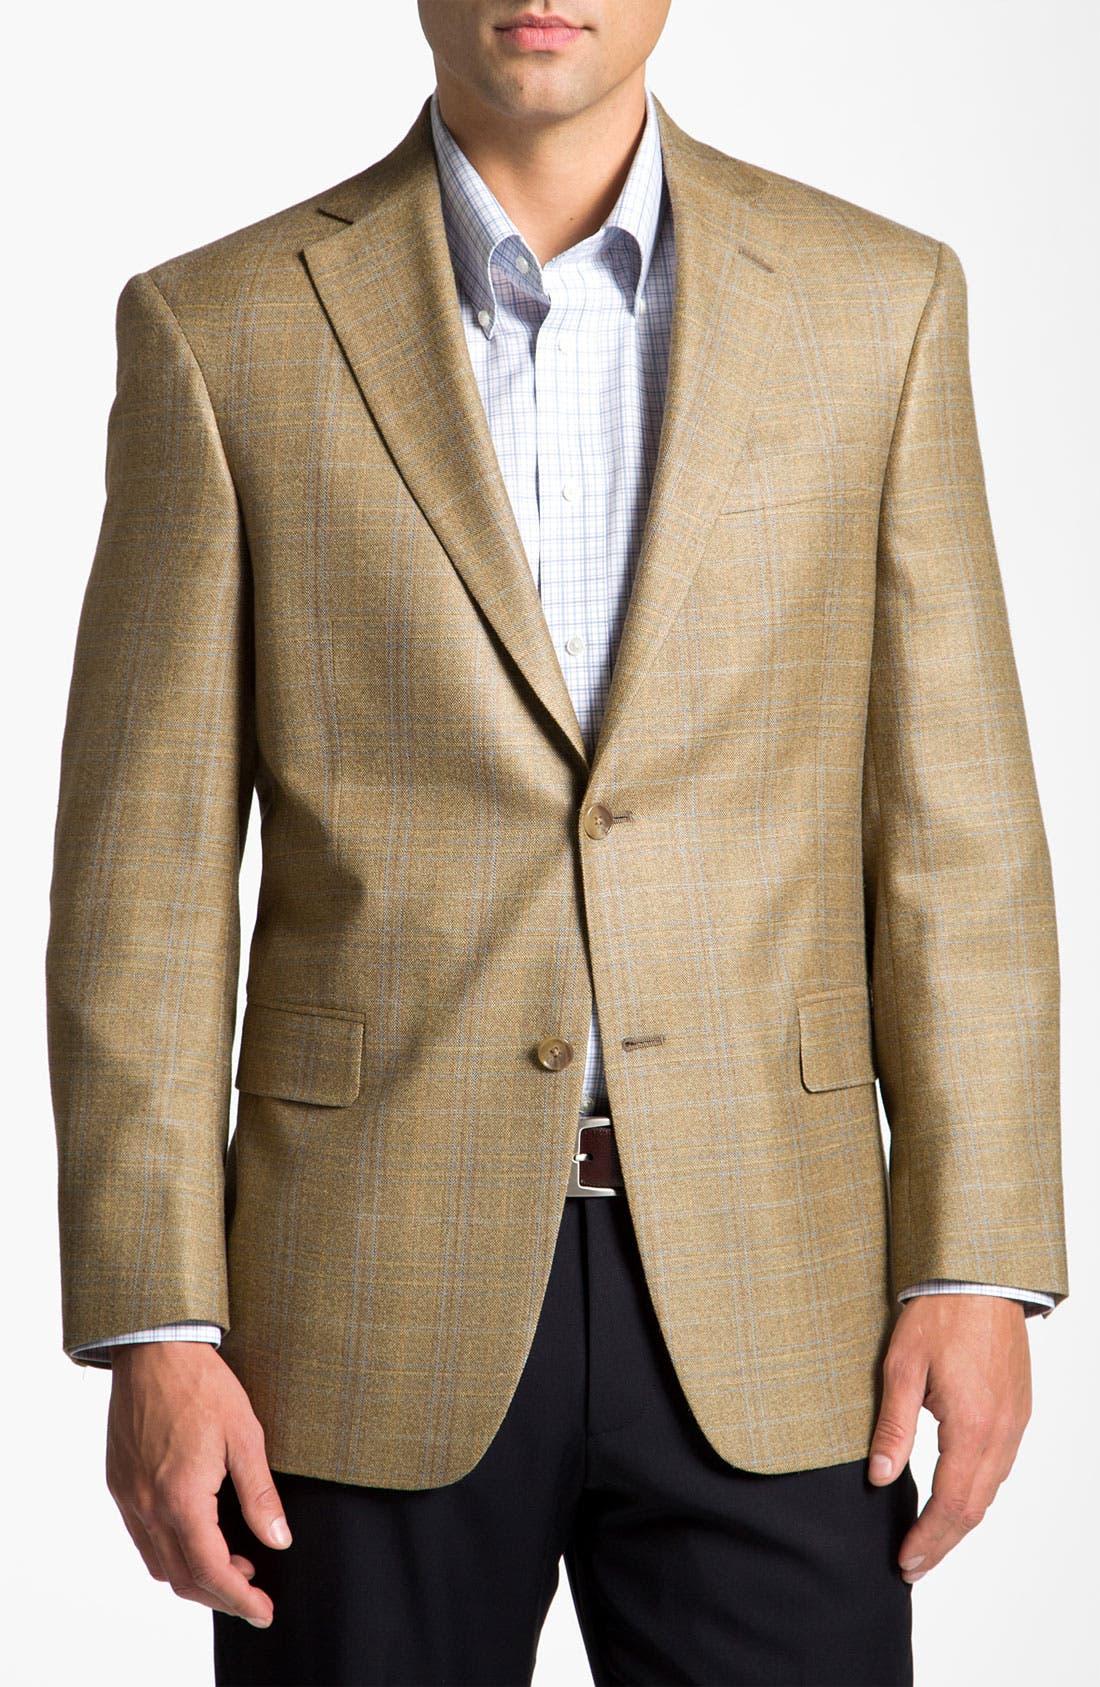 Main Image - Hart Schaffner Marx Brown Plaid Wool Sportcoat